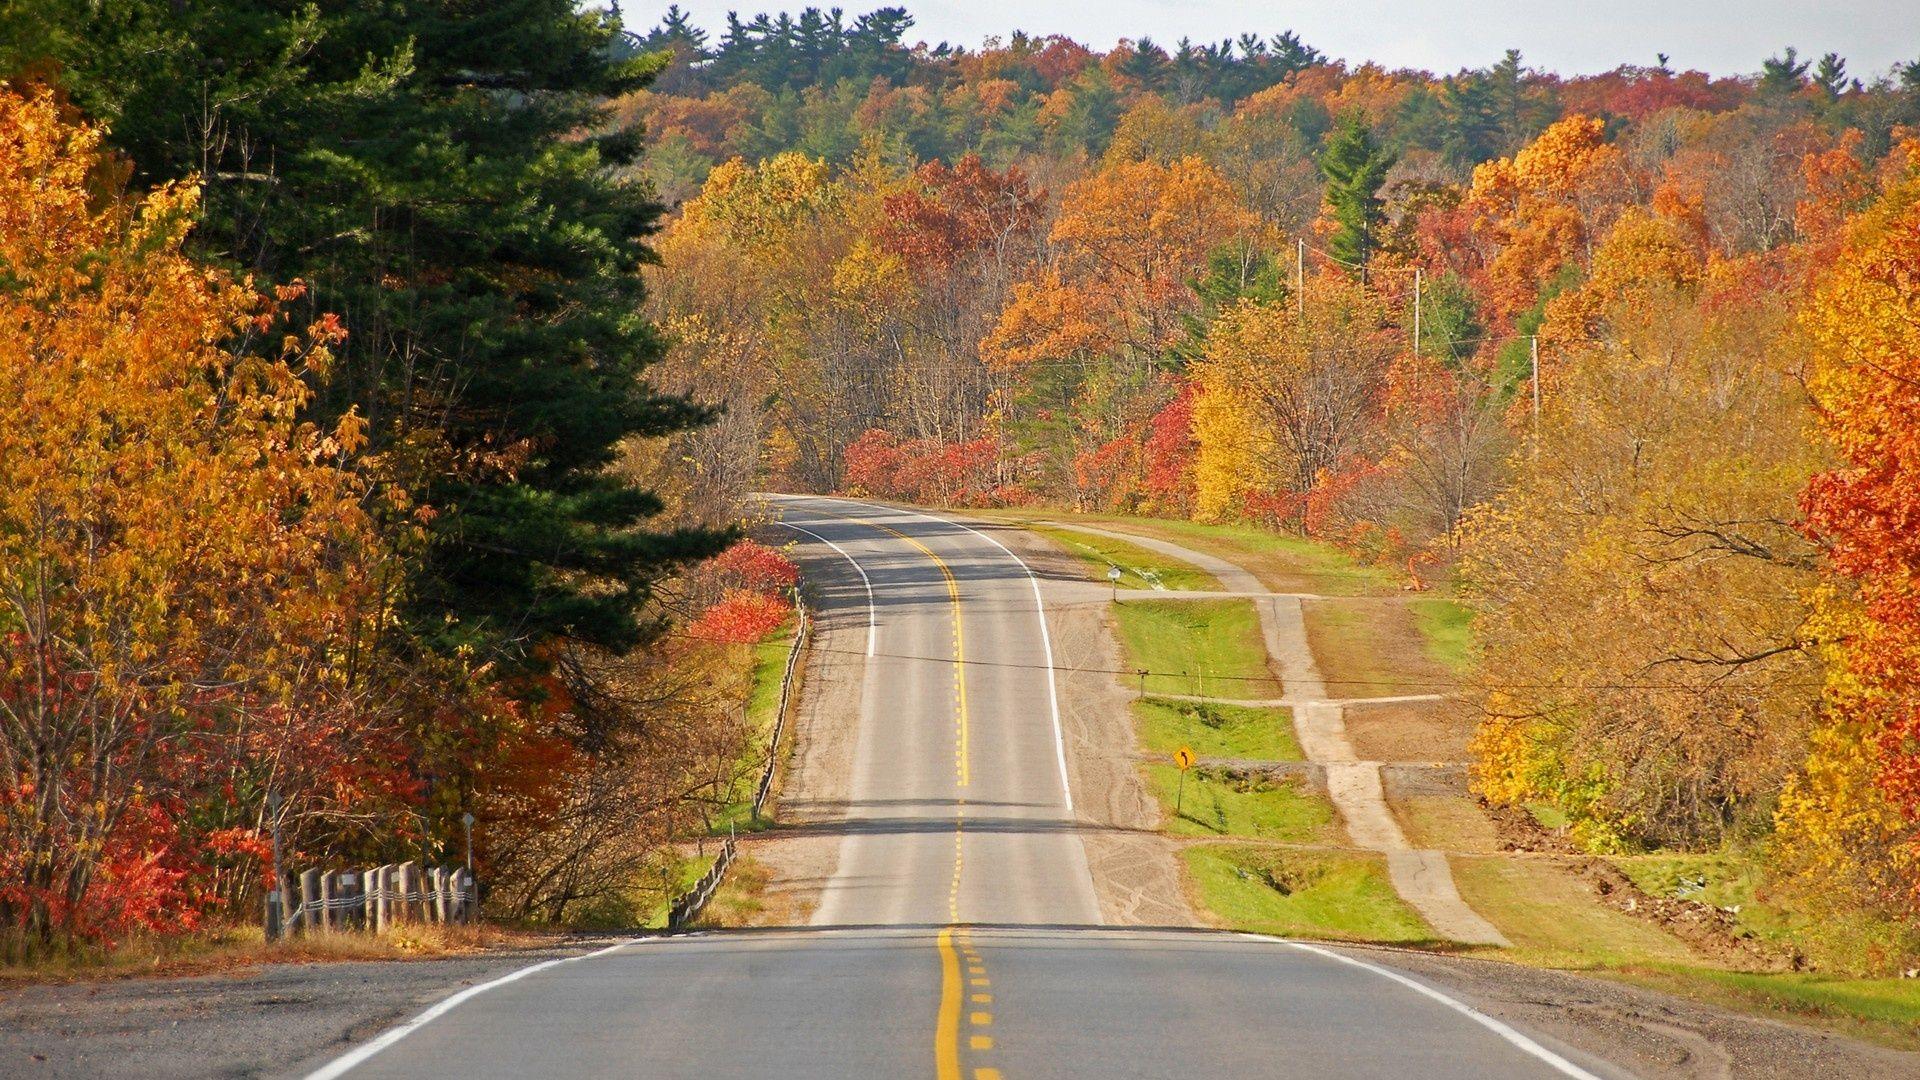 1920x1080 Beautiful Road Ahead Hd Wallpapers 1080p Beautiful Roads Landscape Wallpaper Nature Wallpaper